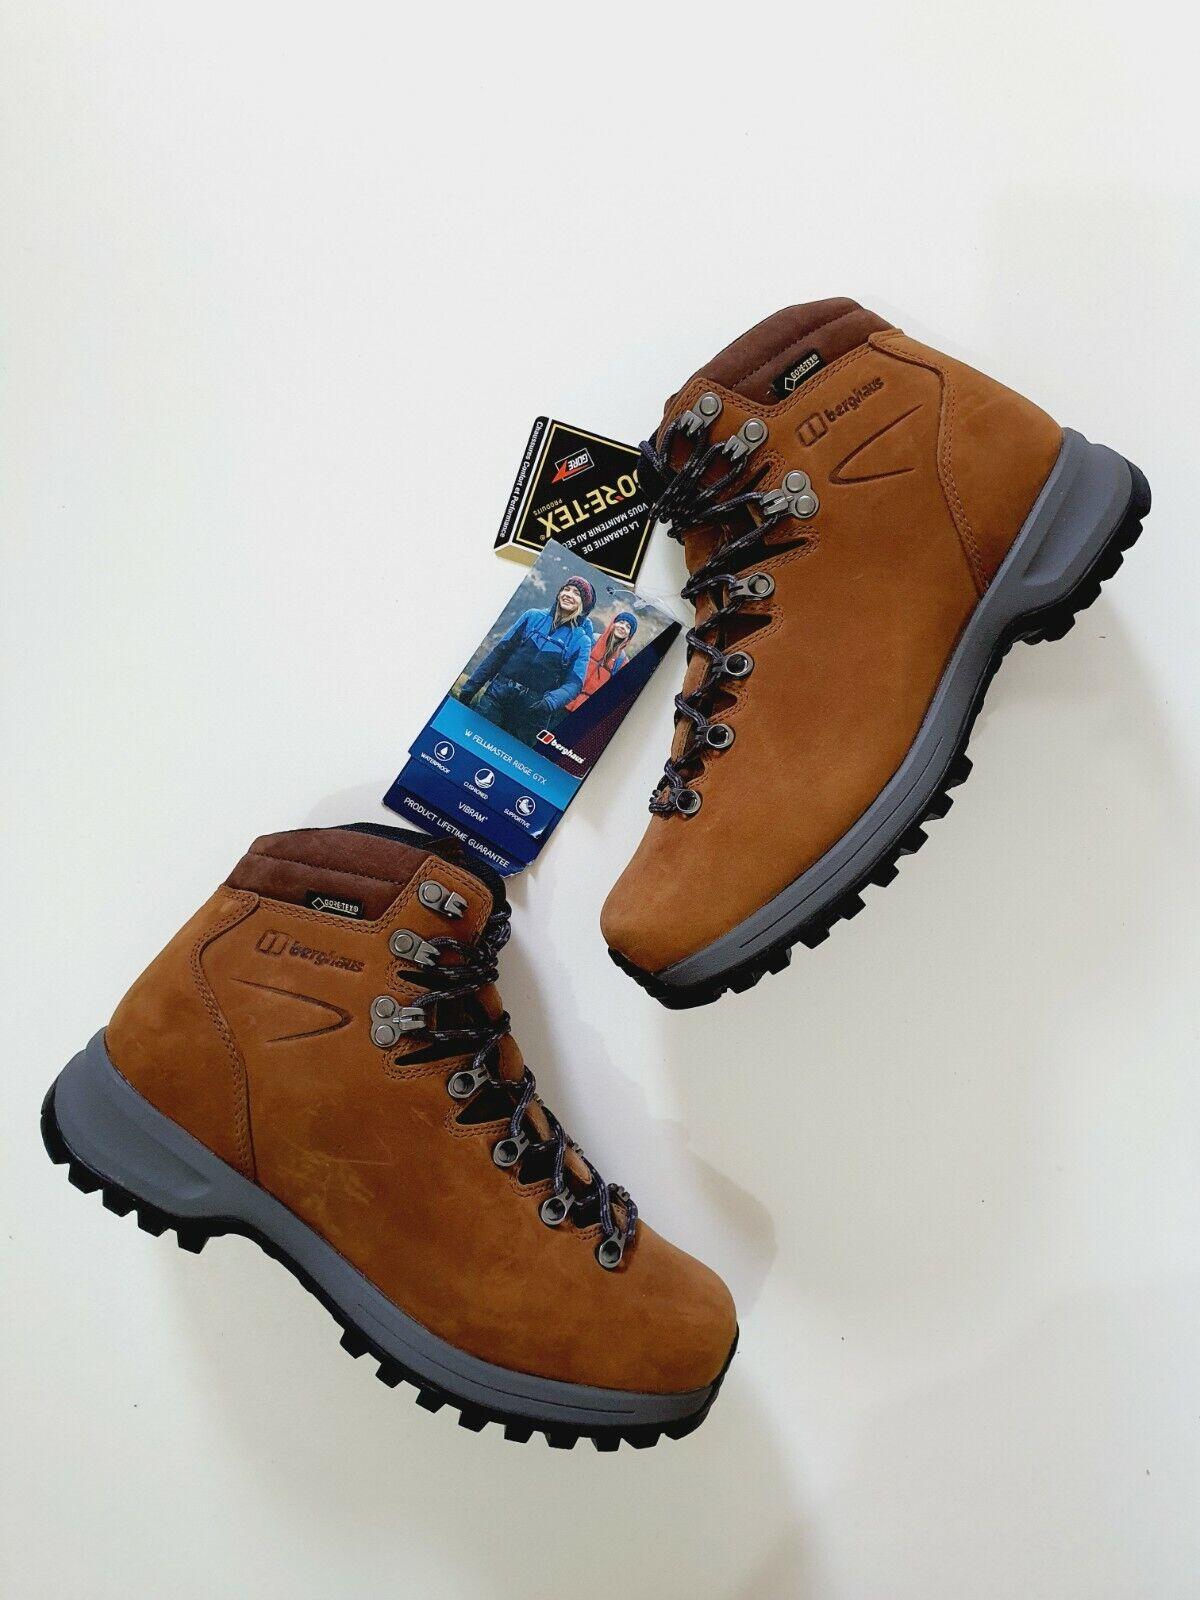 Berghaus Womens Fellmaster Ridge GTX Vibram Cushioned Brown Leather Boots UK 5